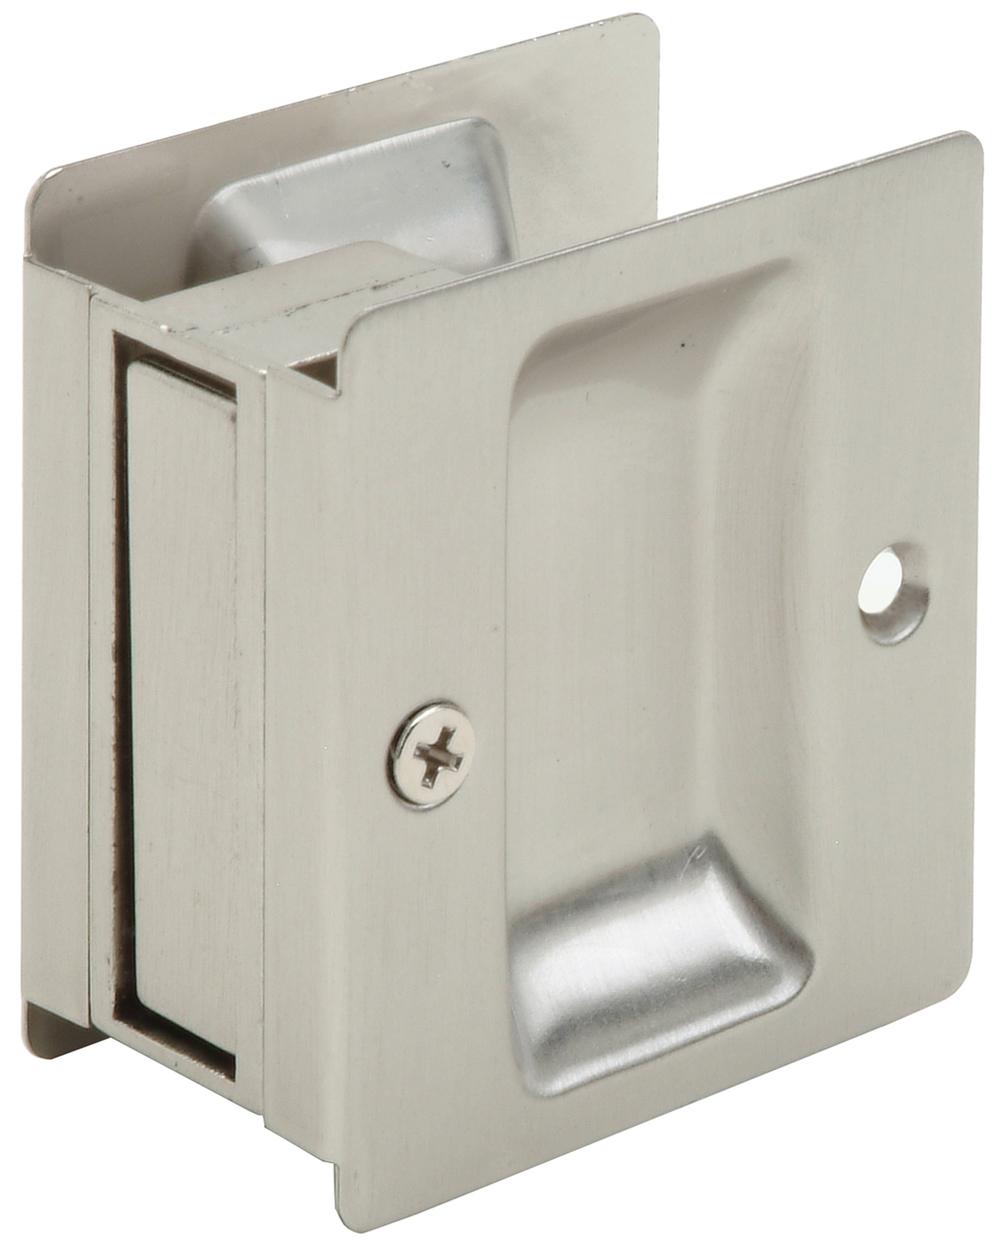 Pf1 Series Sliding Door Locks Pamex